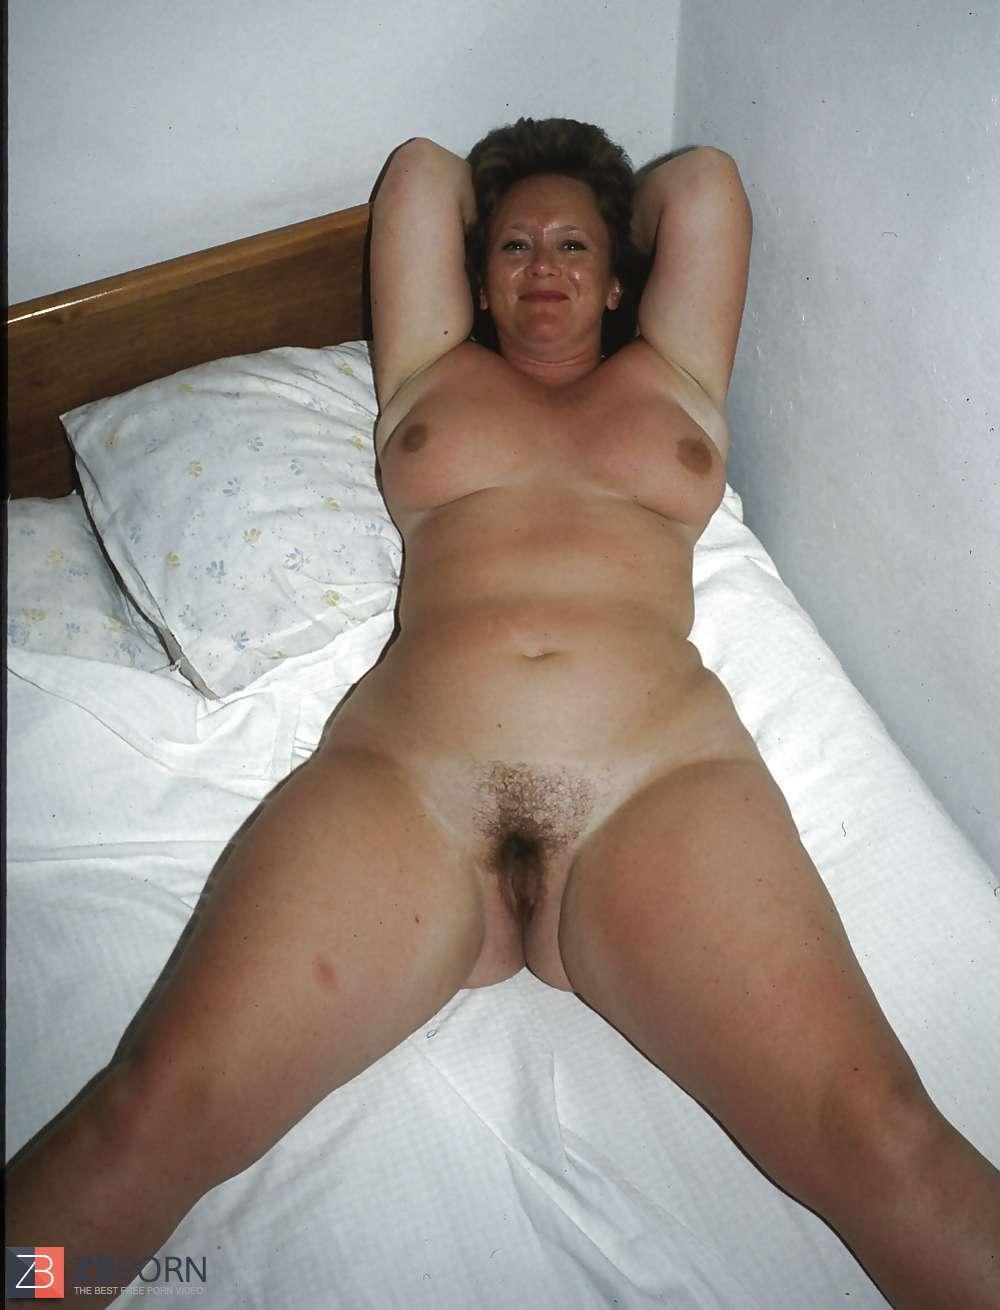 Mum Moie Porn Mature mom next door blowjob - new sex images.